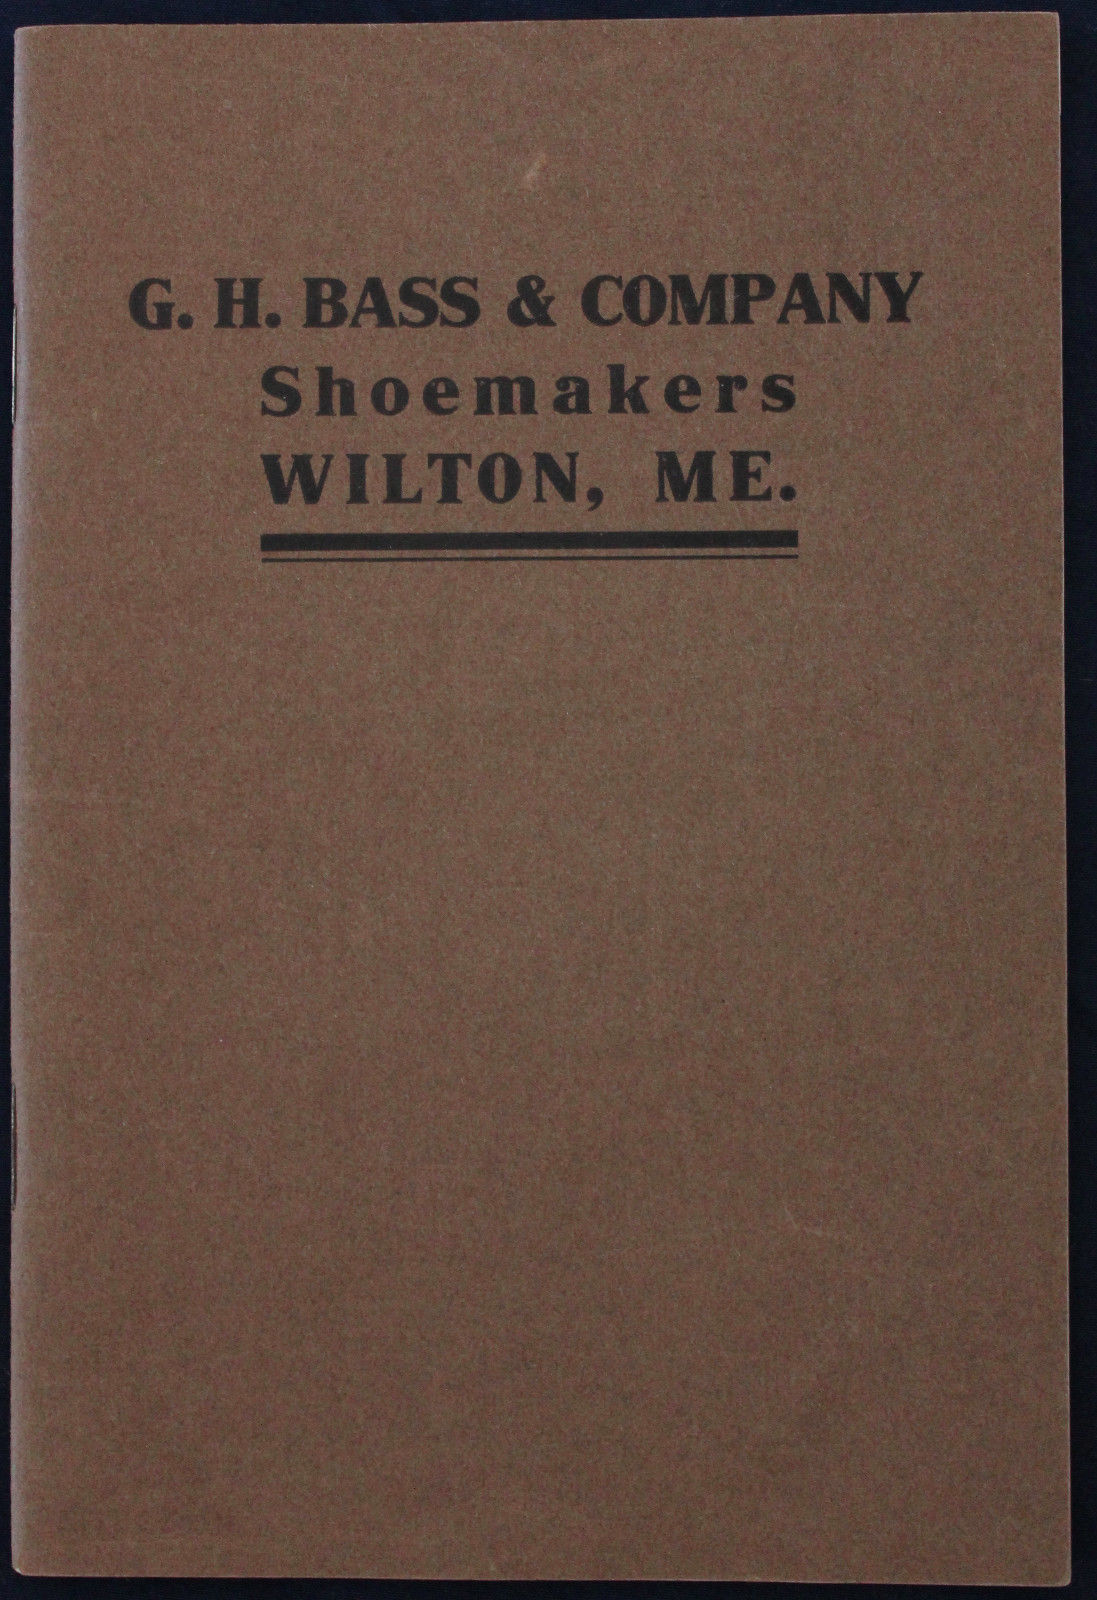 1910$_57 (17)